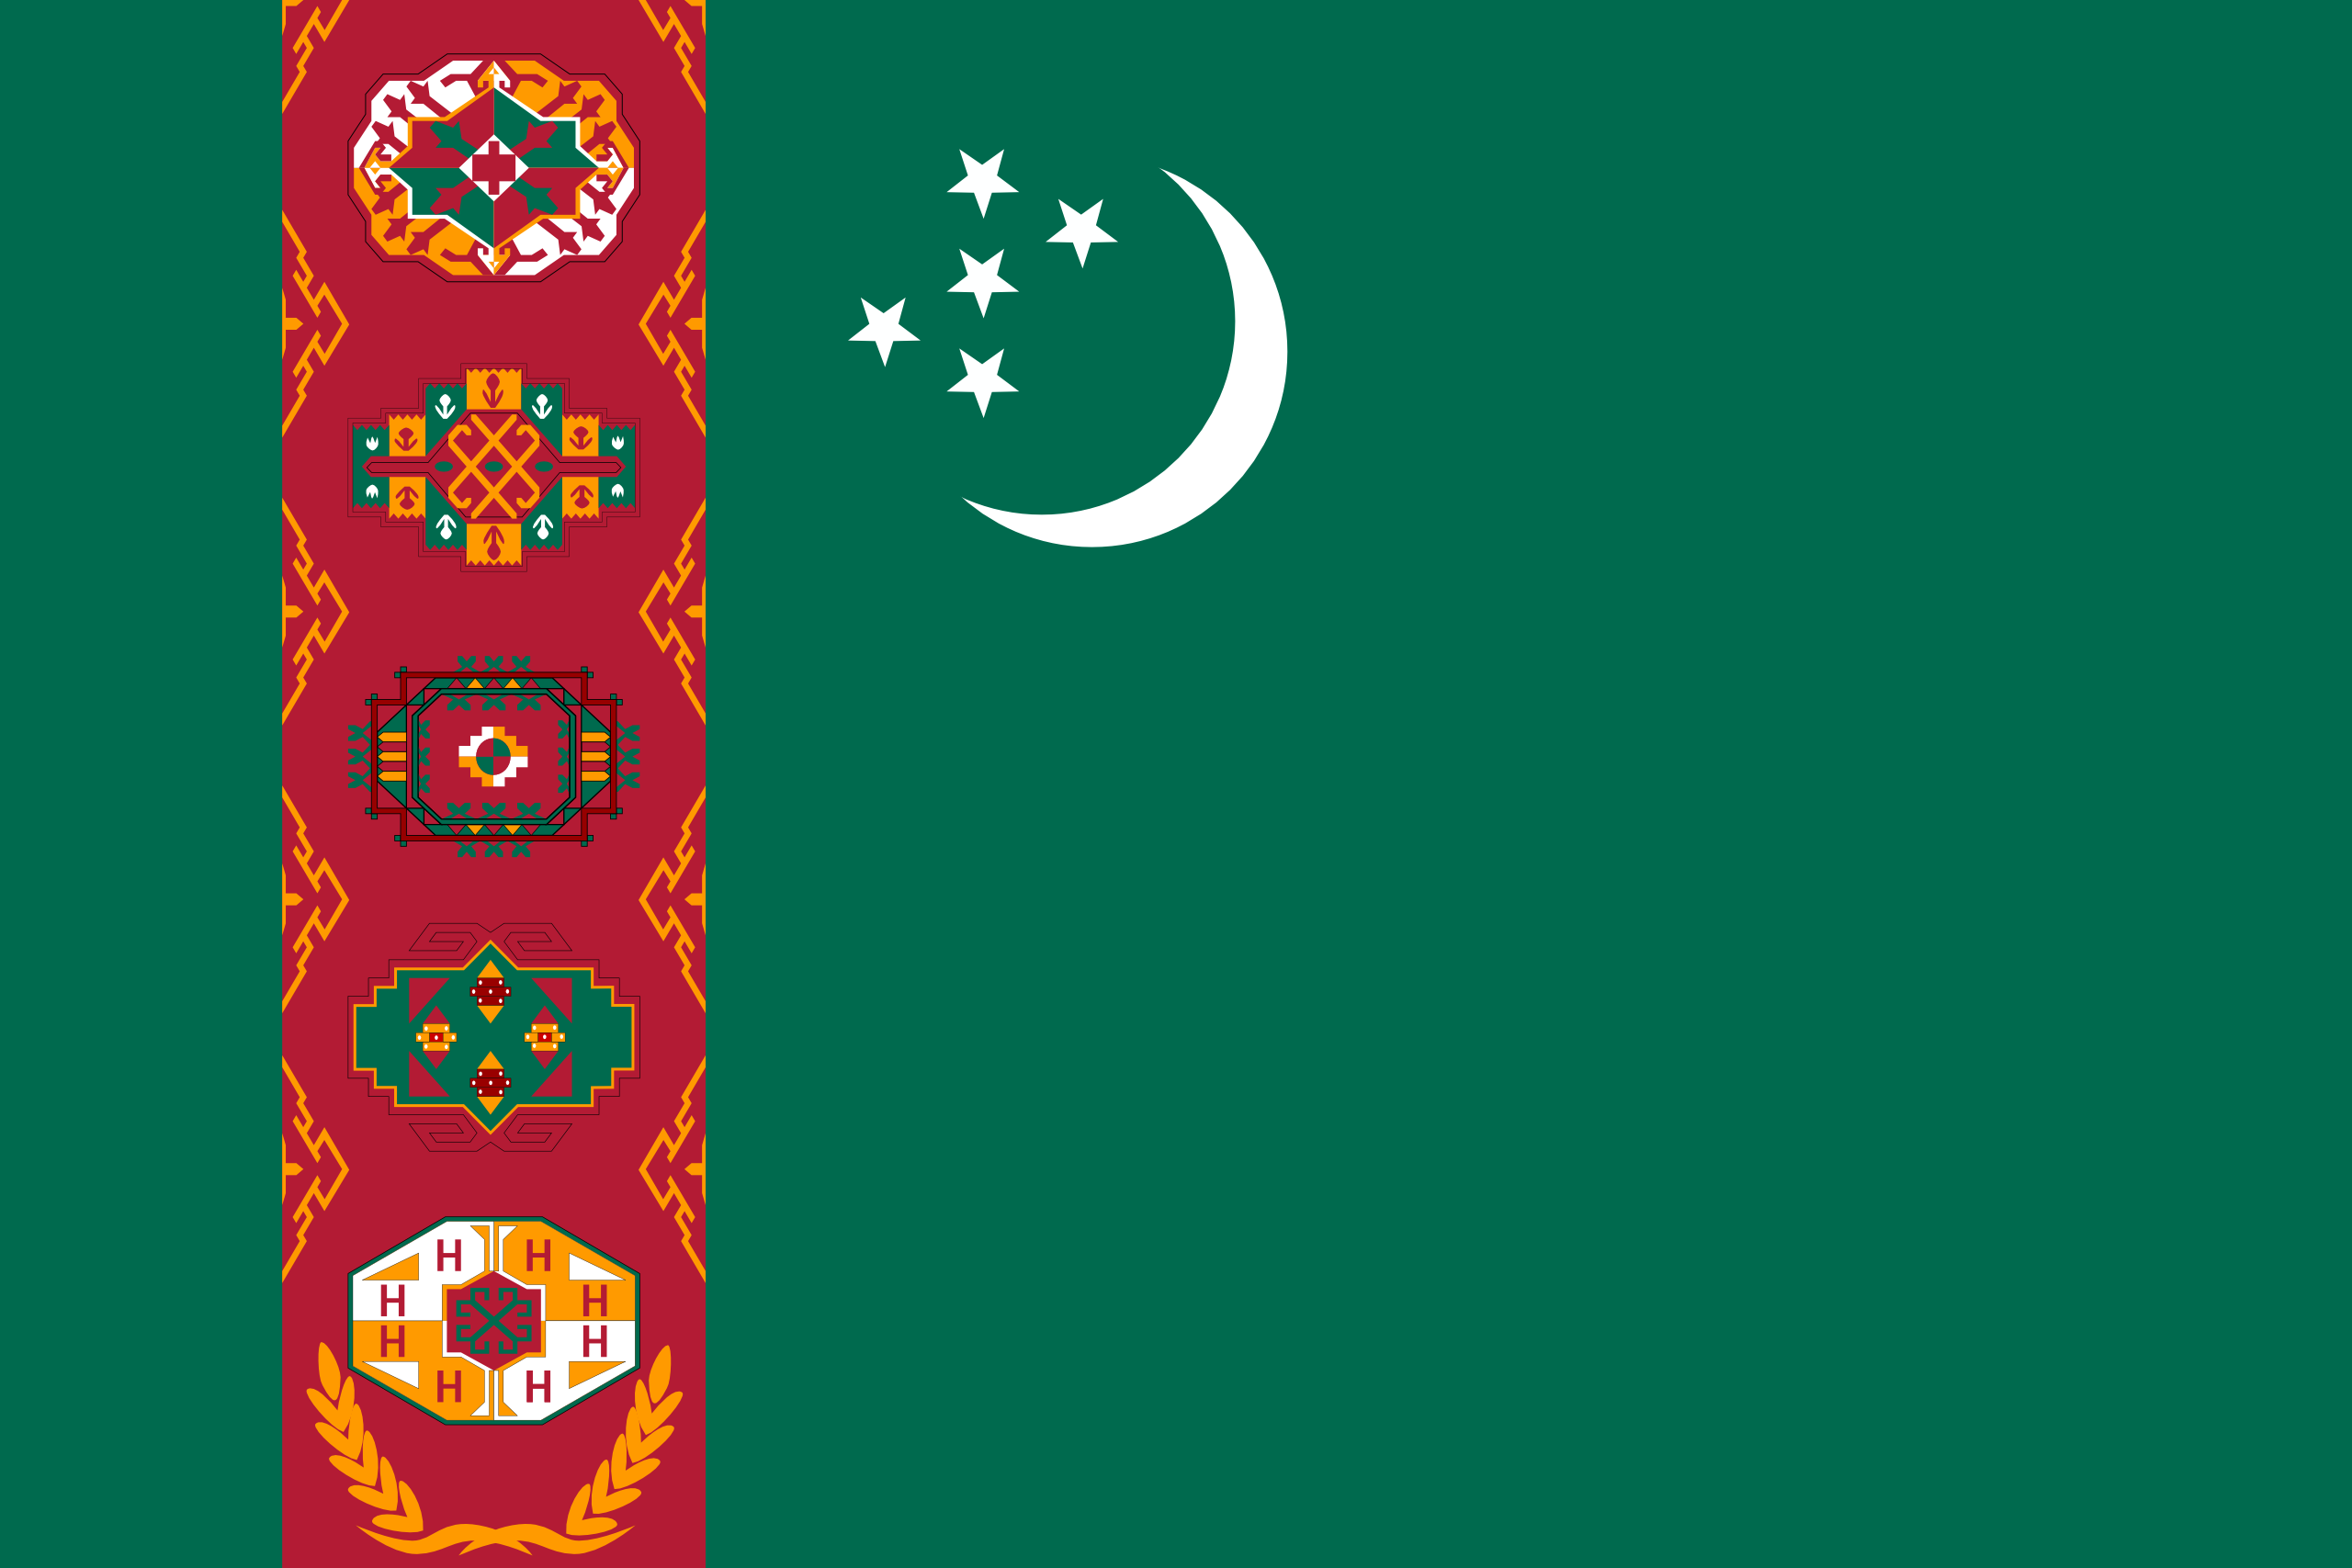 turkmenistán, страна, Эмблема, логотип, символ - Обои HD - Профессор falken.com